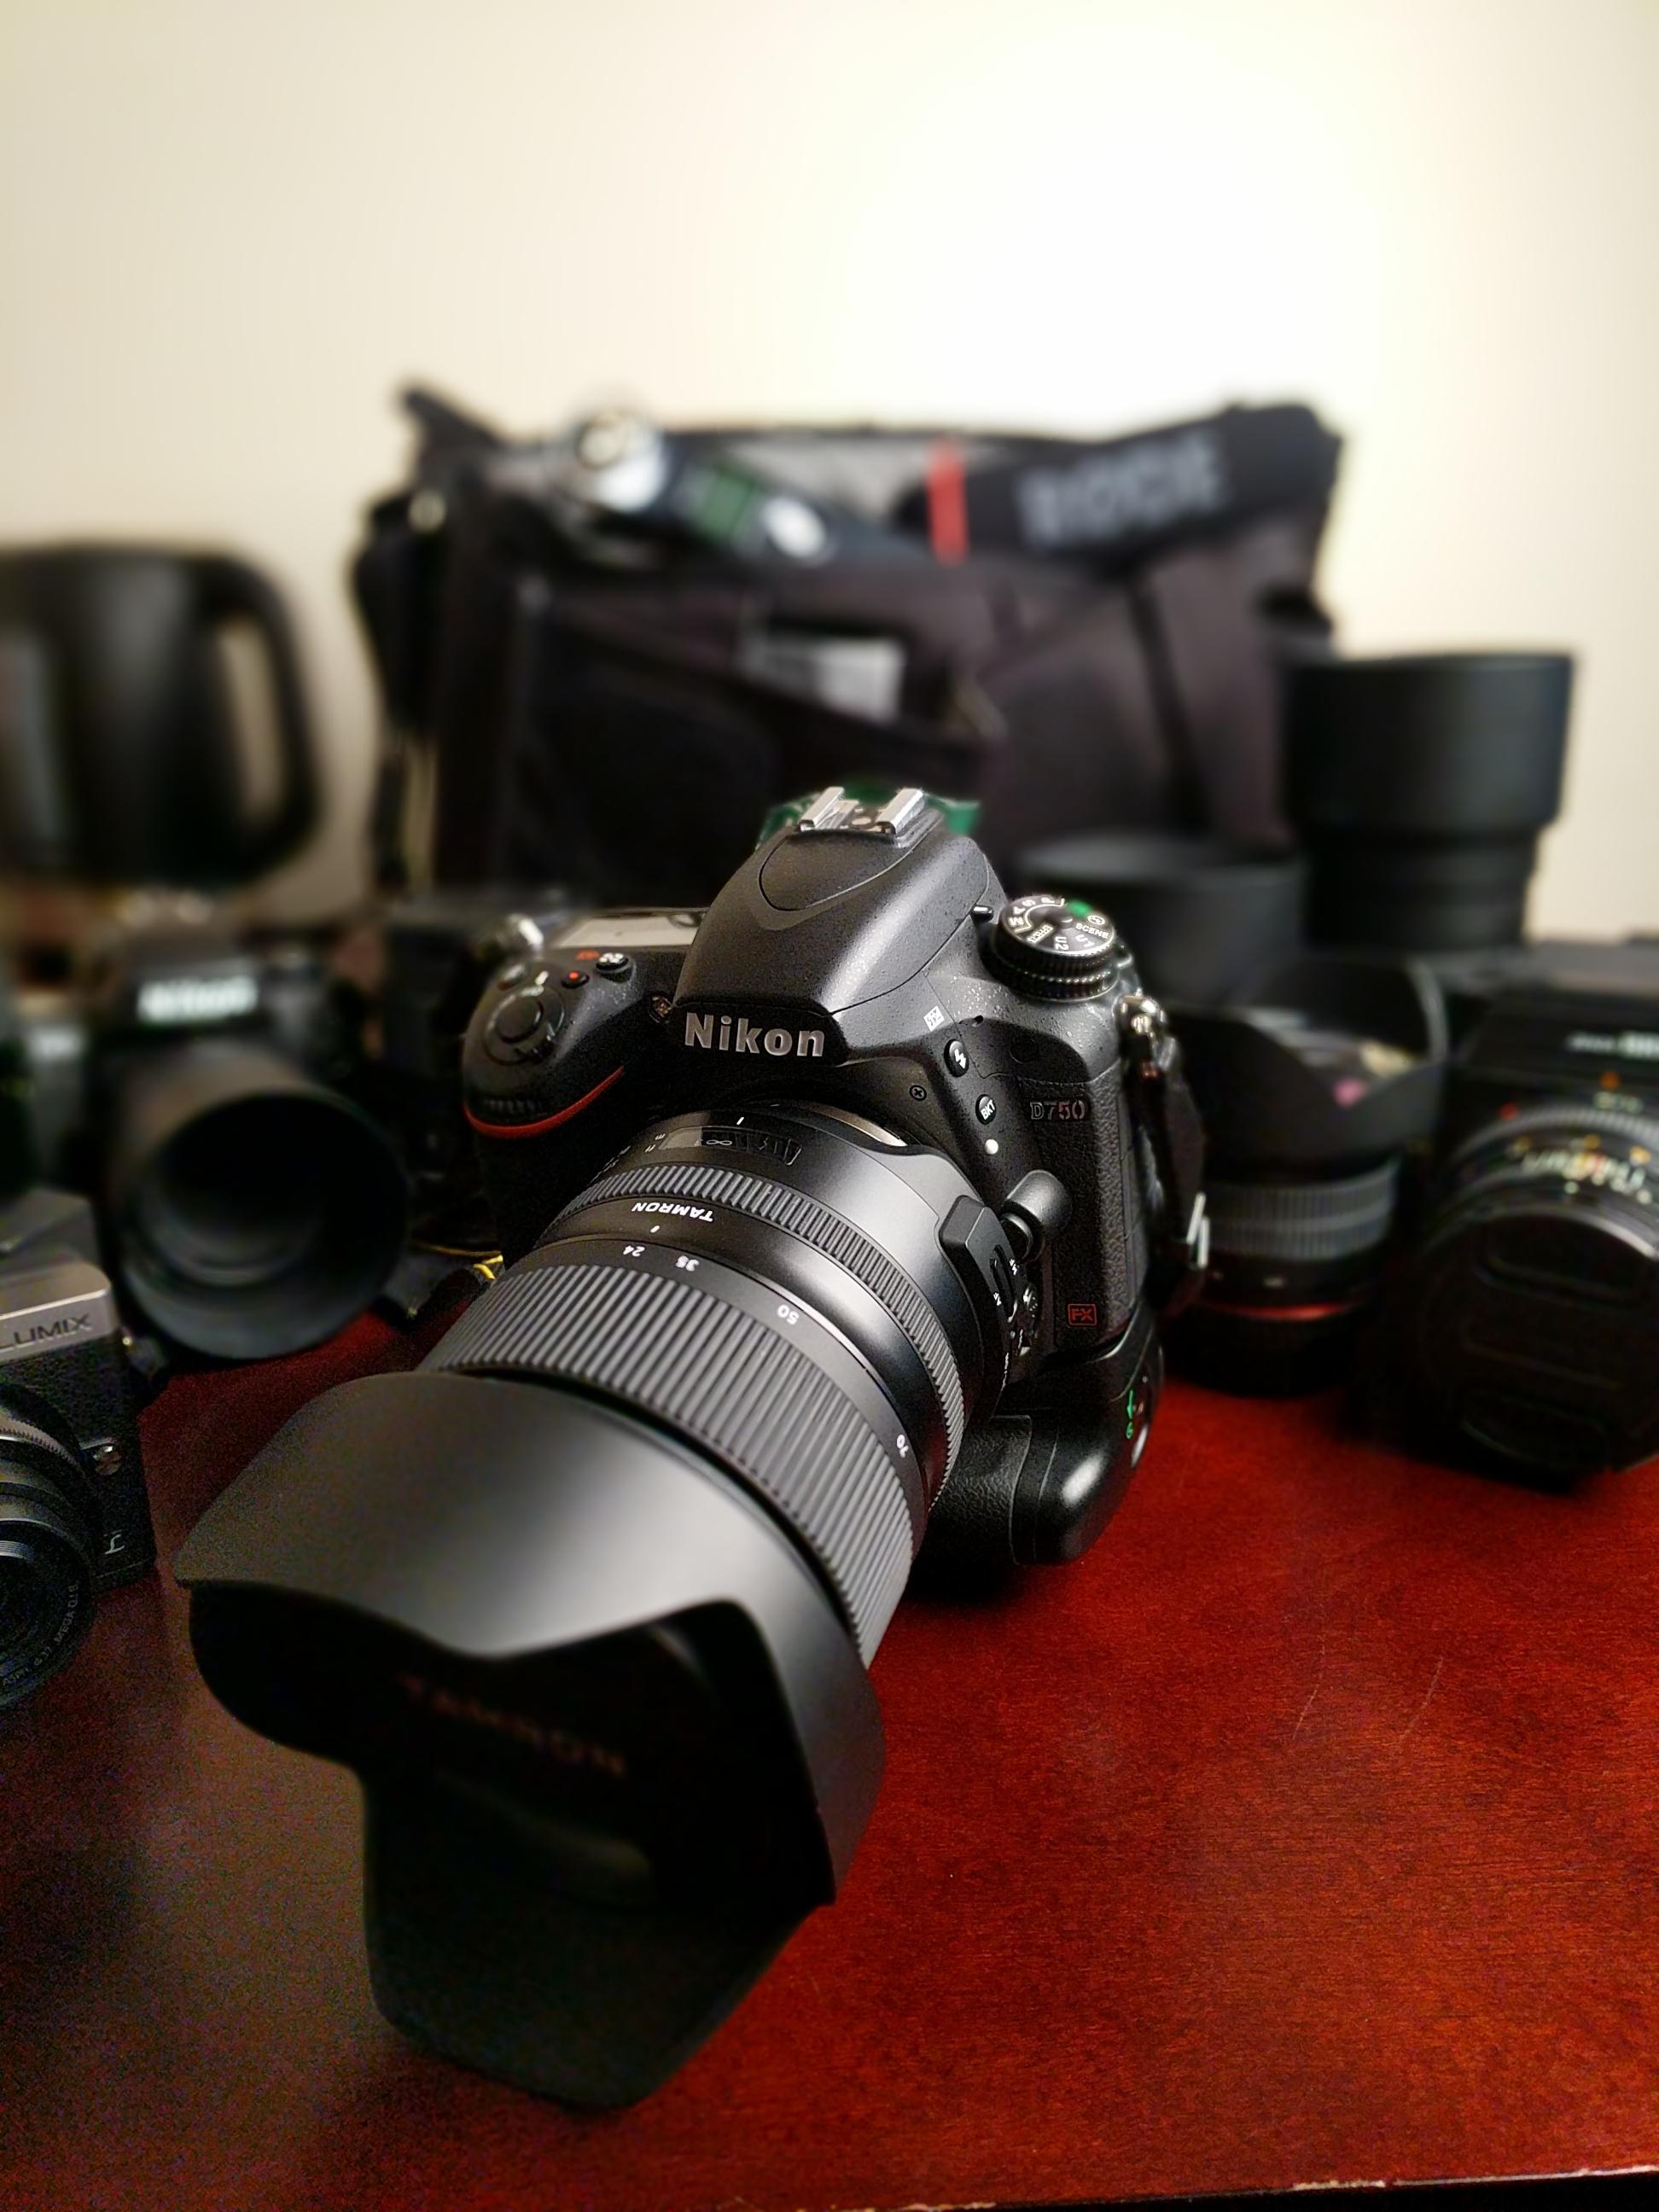 Nikon D750 and Tamron 24-70mm f/2.8 G2